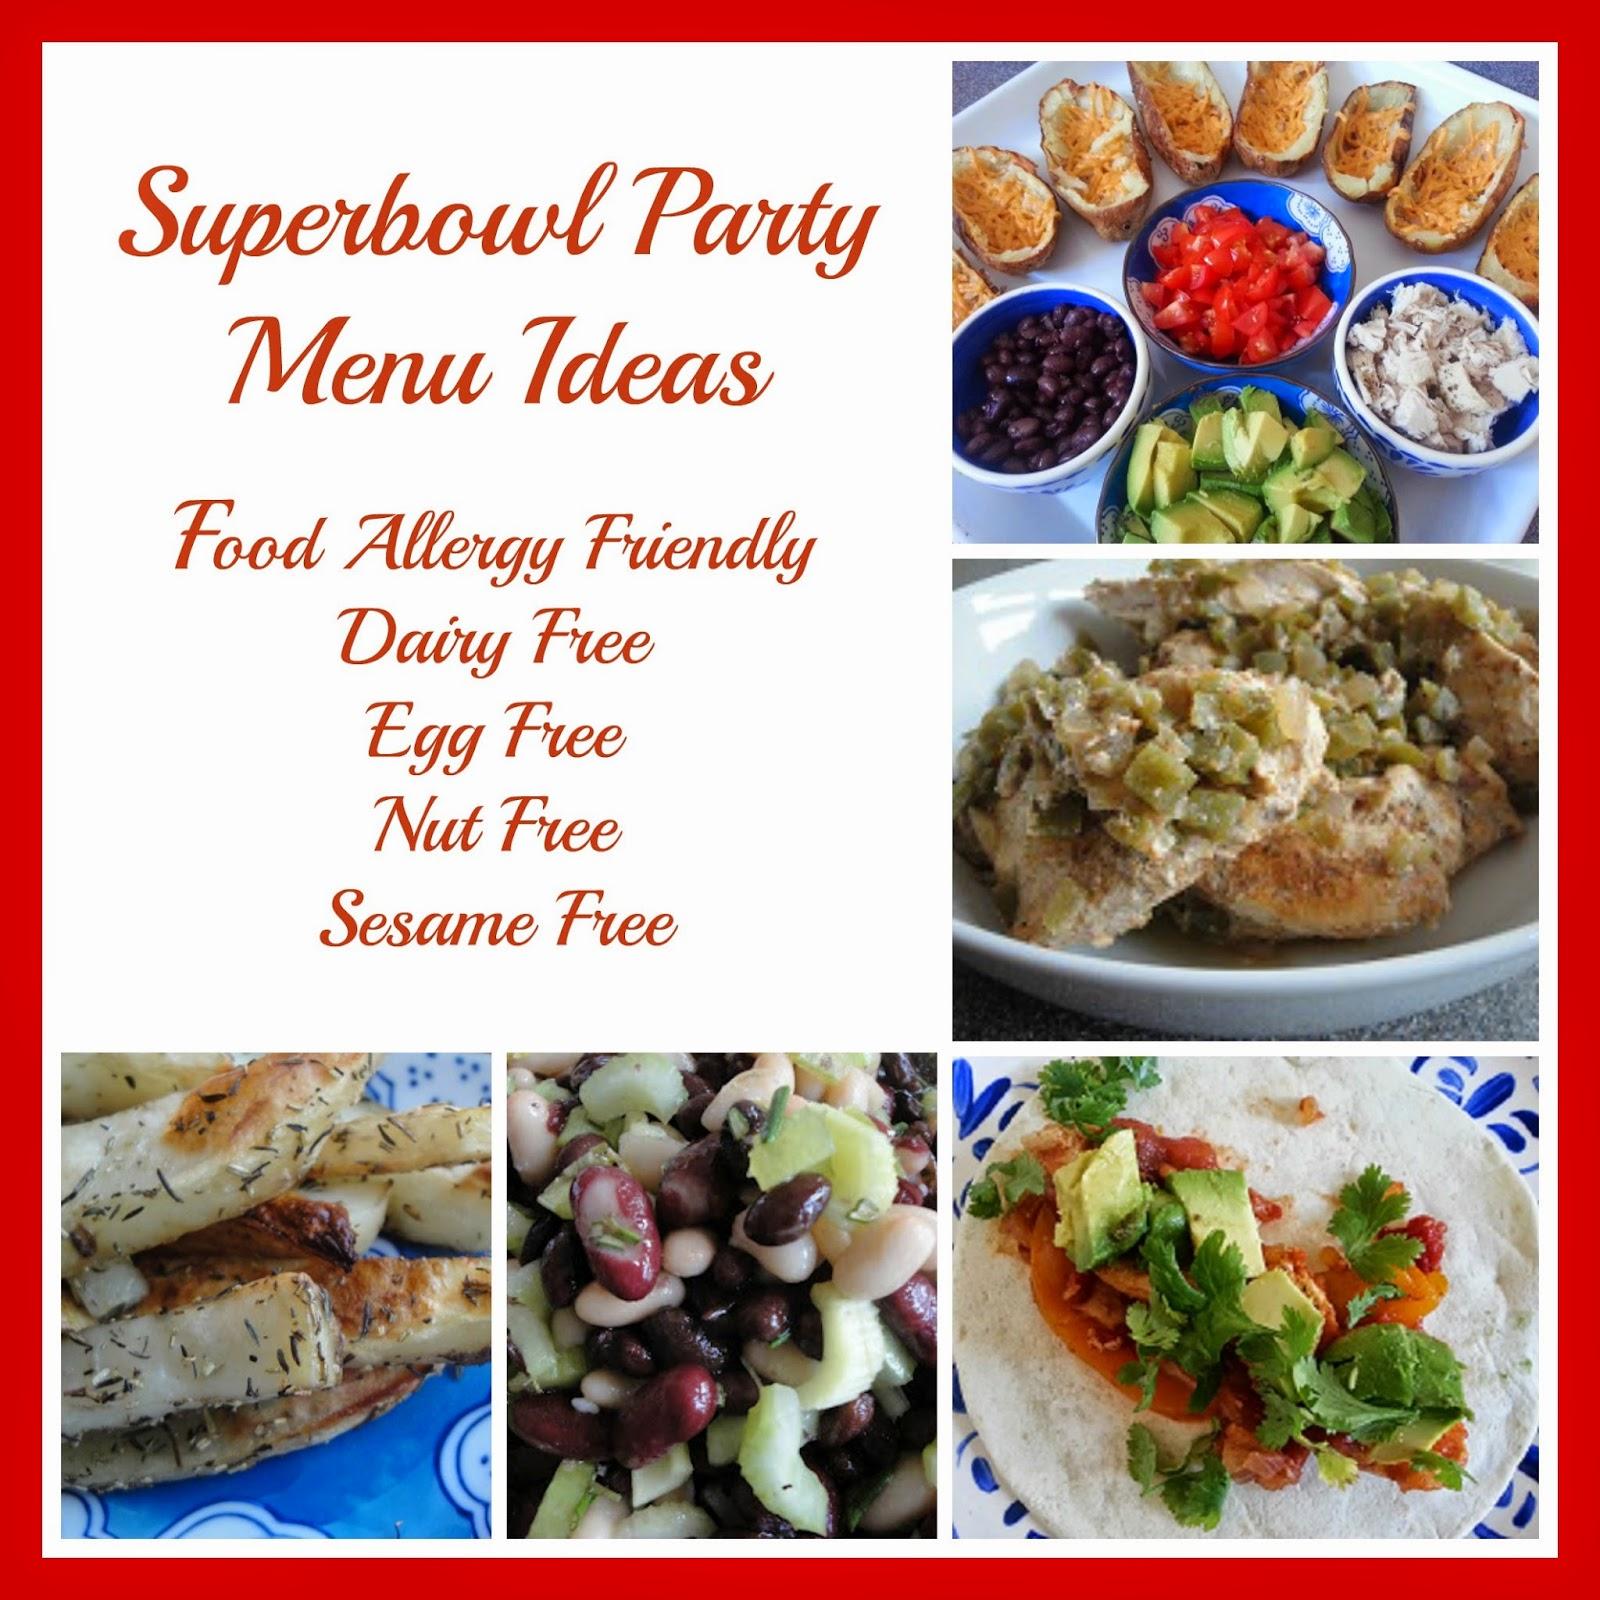 Last Minute Superbowl Party Menu Ideas